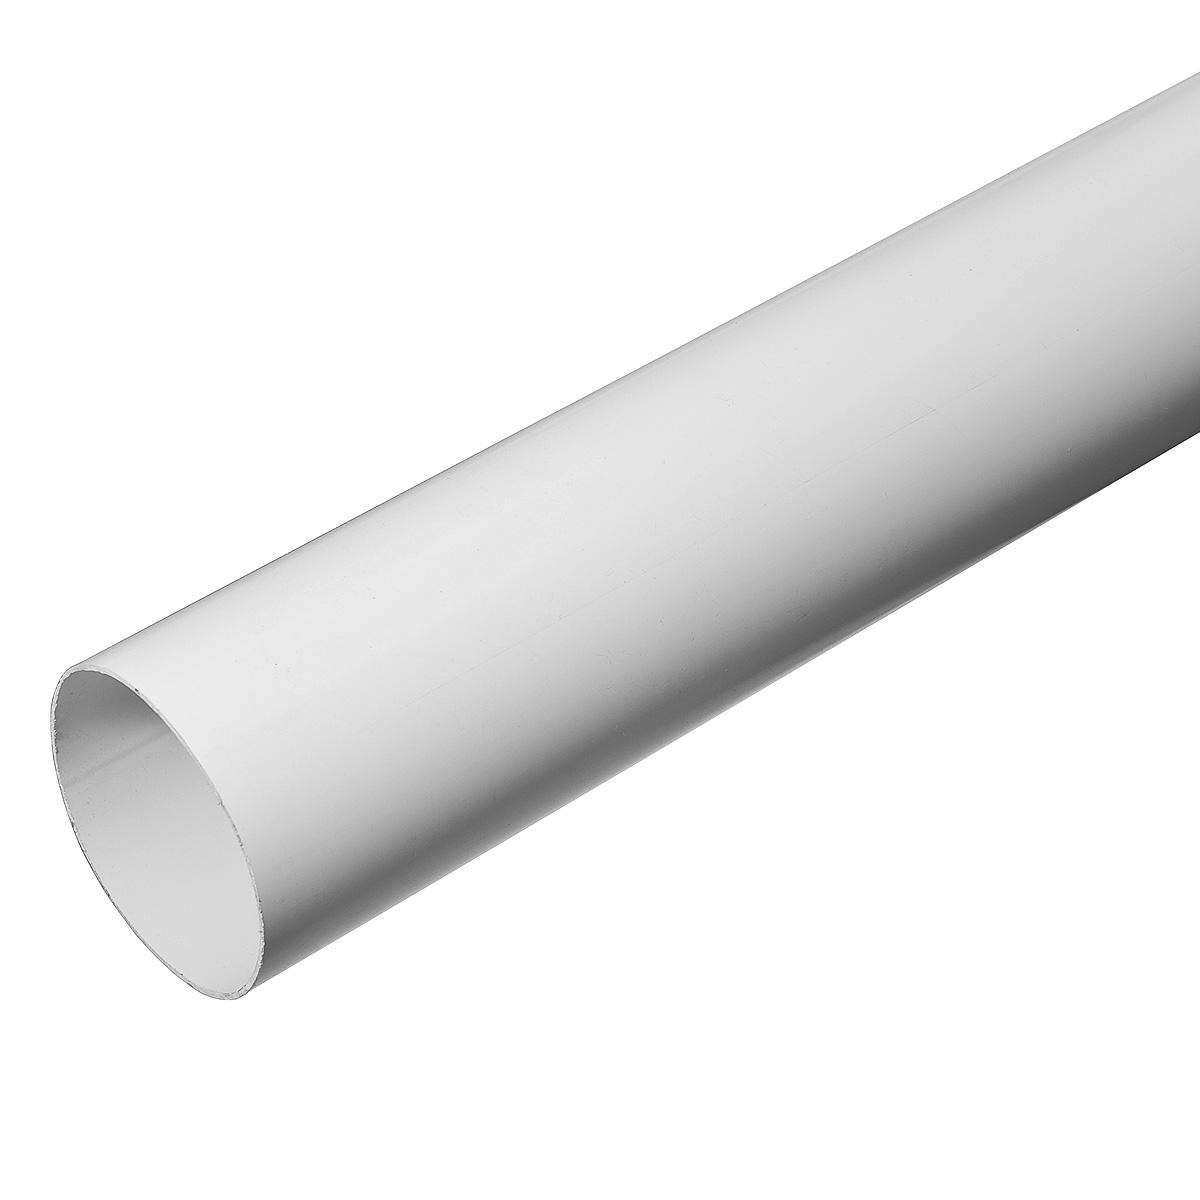 Труба водосточная пластиковая d90 мм  белая 4м VINYL-ON